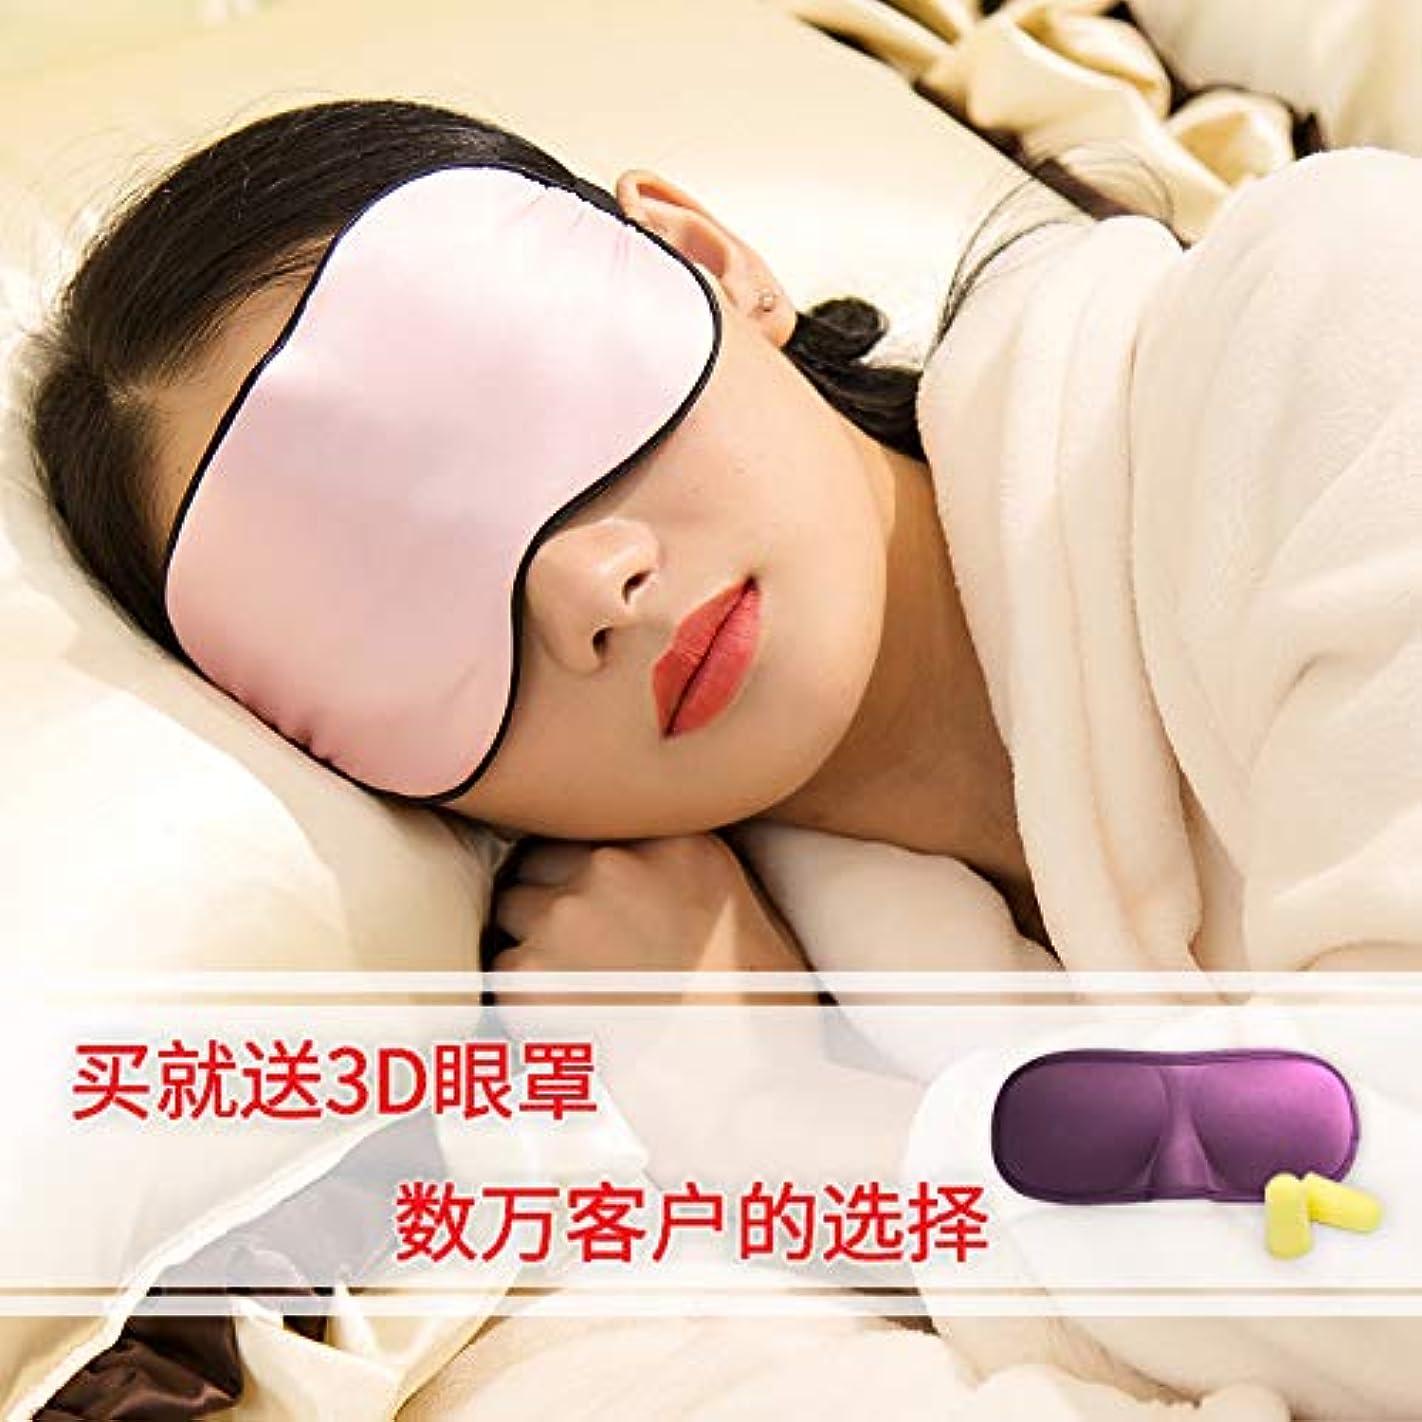 NOTE 100%シルクの快適な睡眠用アイマスク、耳栓で調節可能なアイシェーディング、通気性ゴーグル